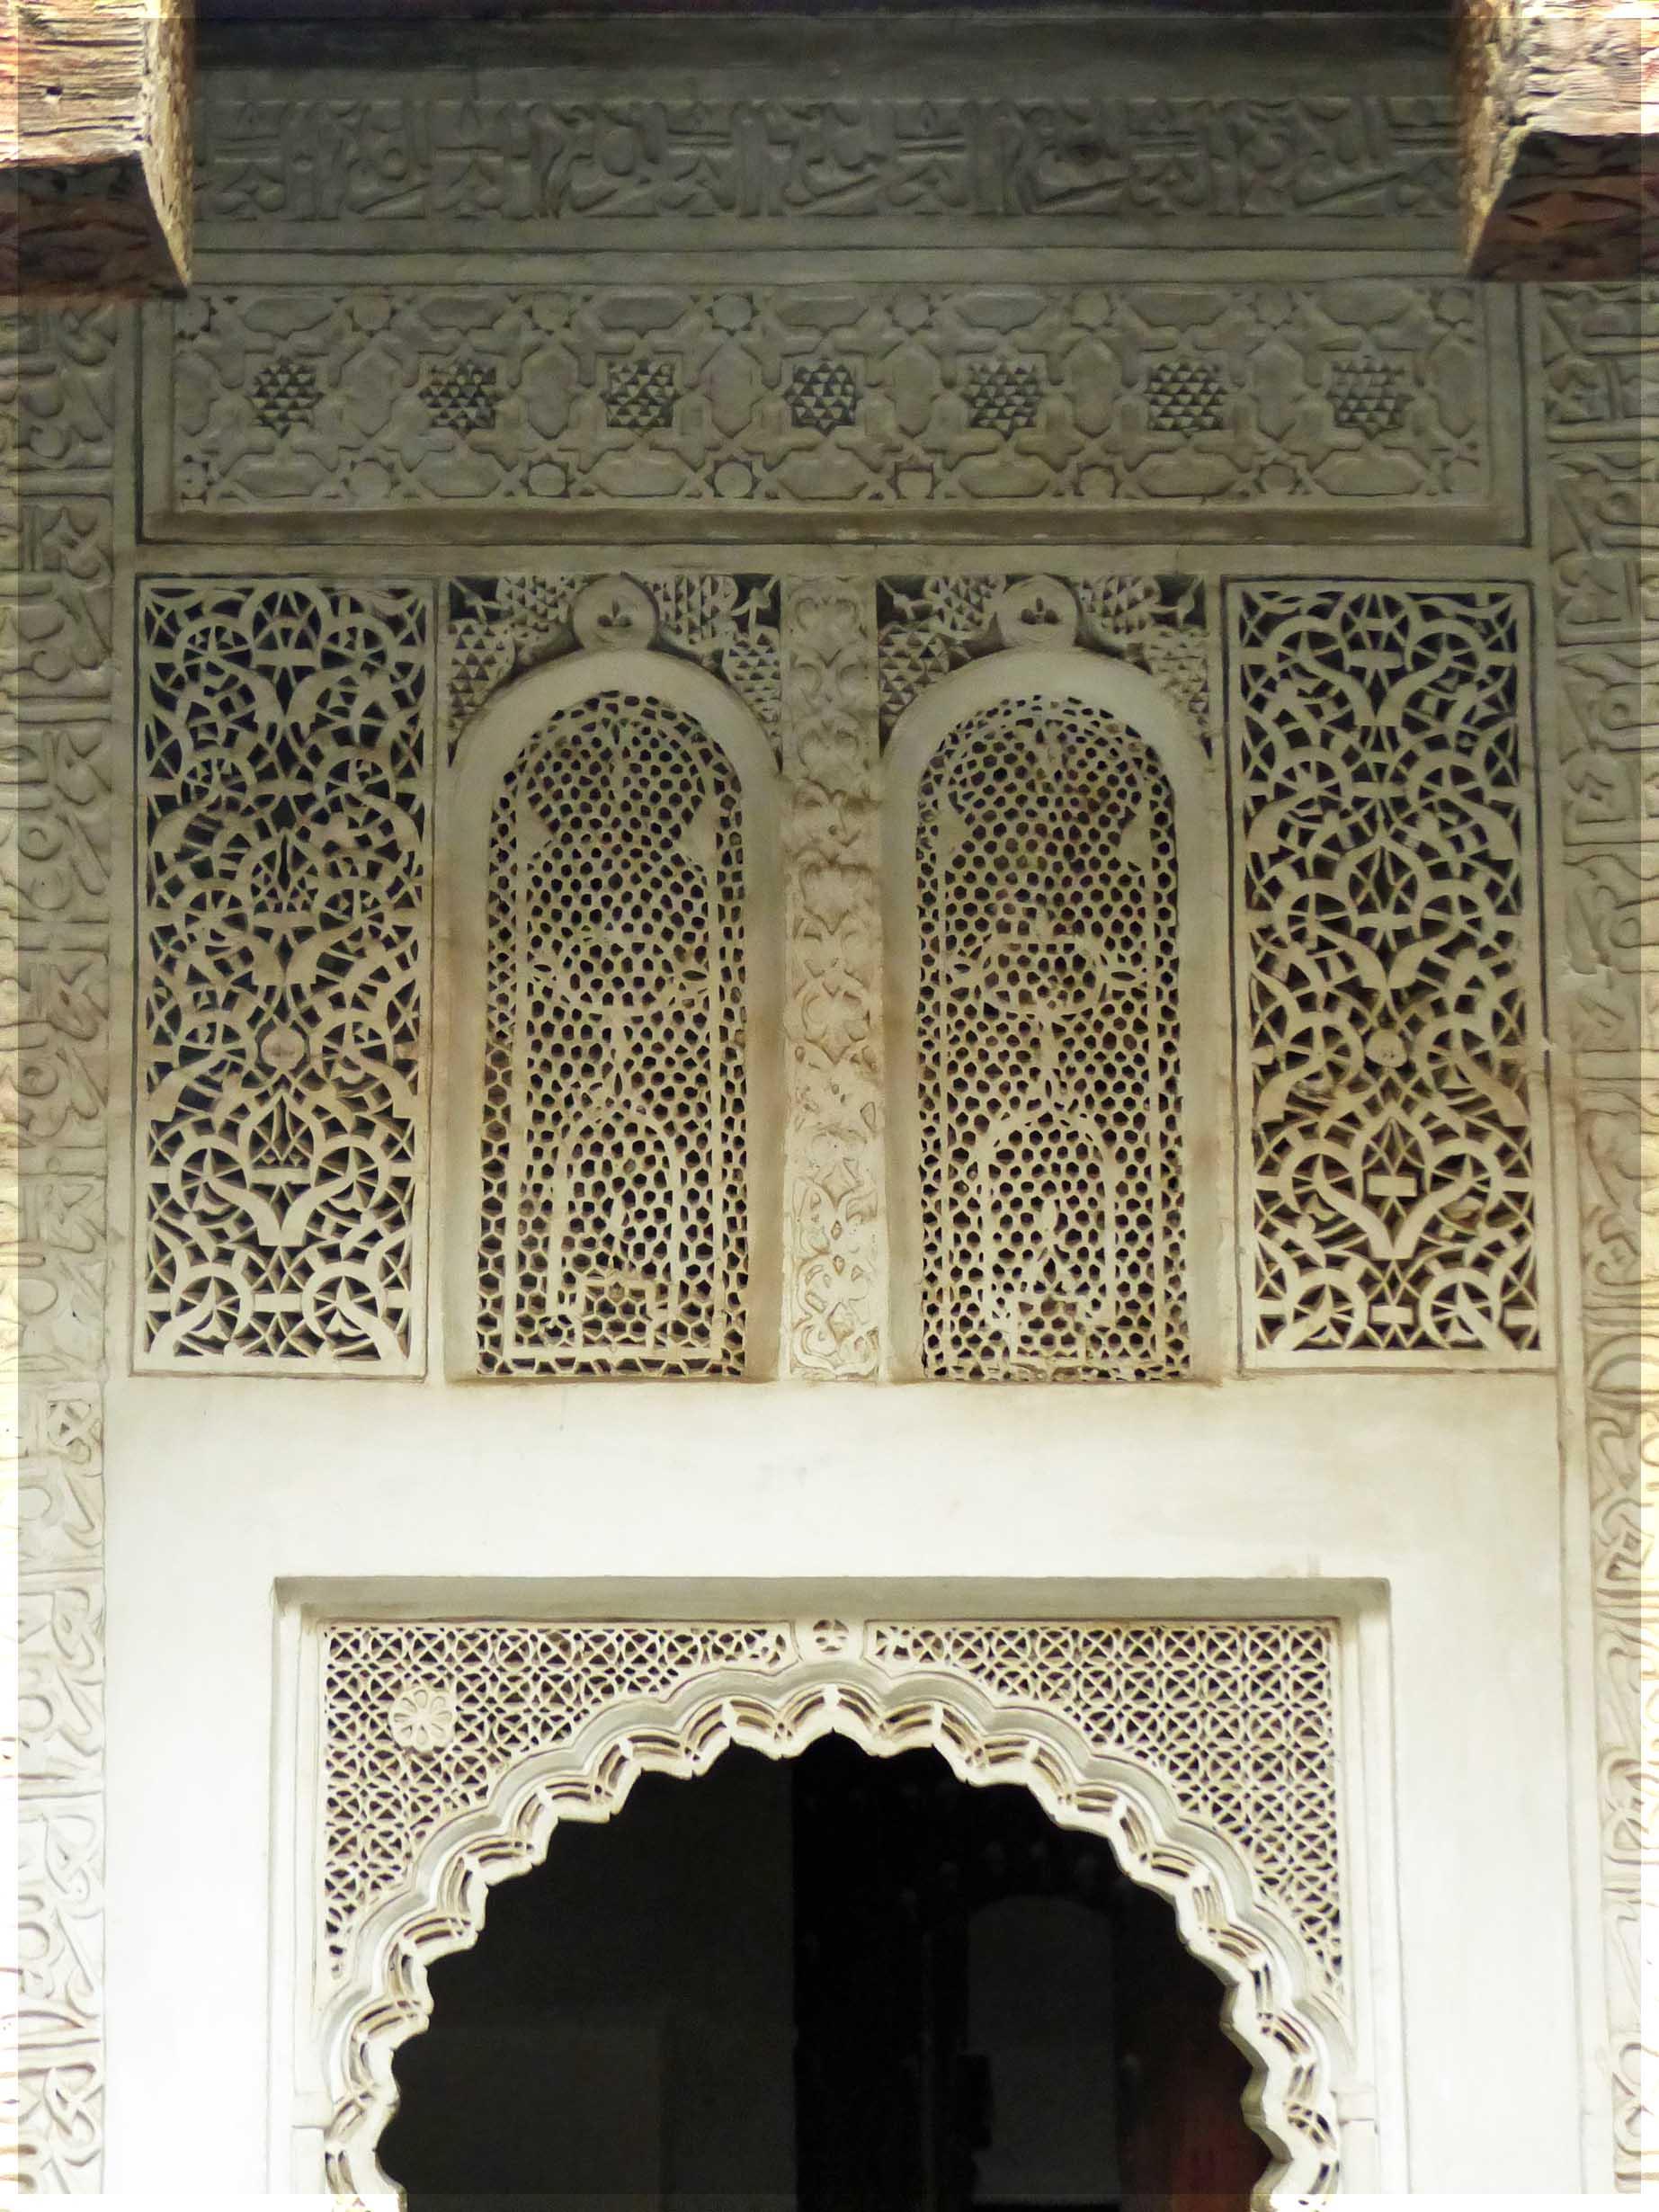 Ornate white stone lattice work